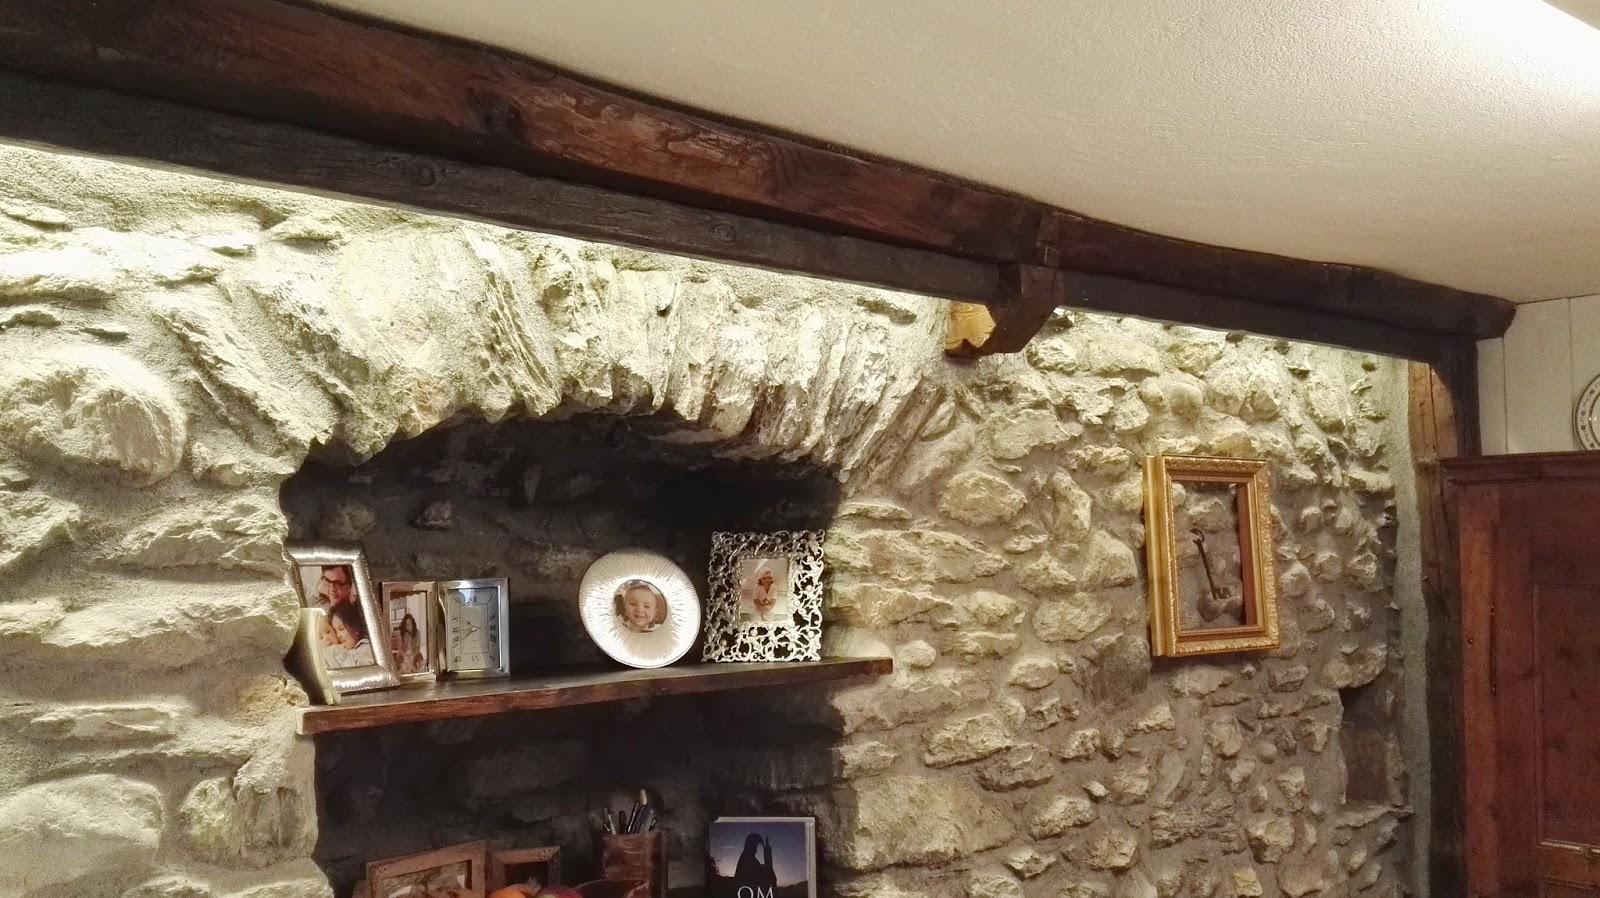 Lampadari per travi in legno. good travatura soffitto with lampadari